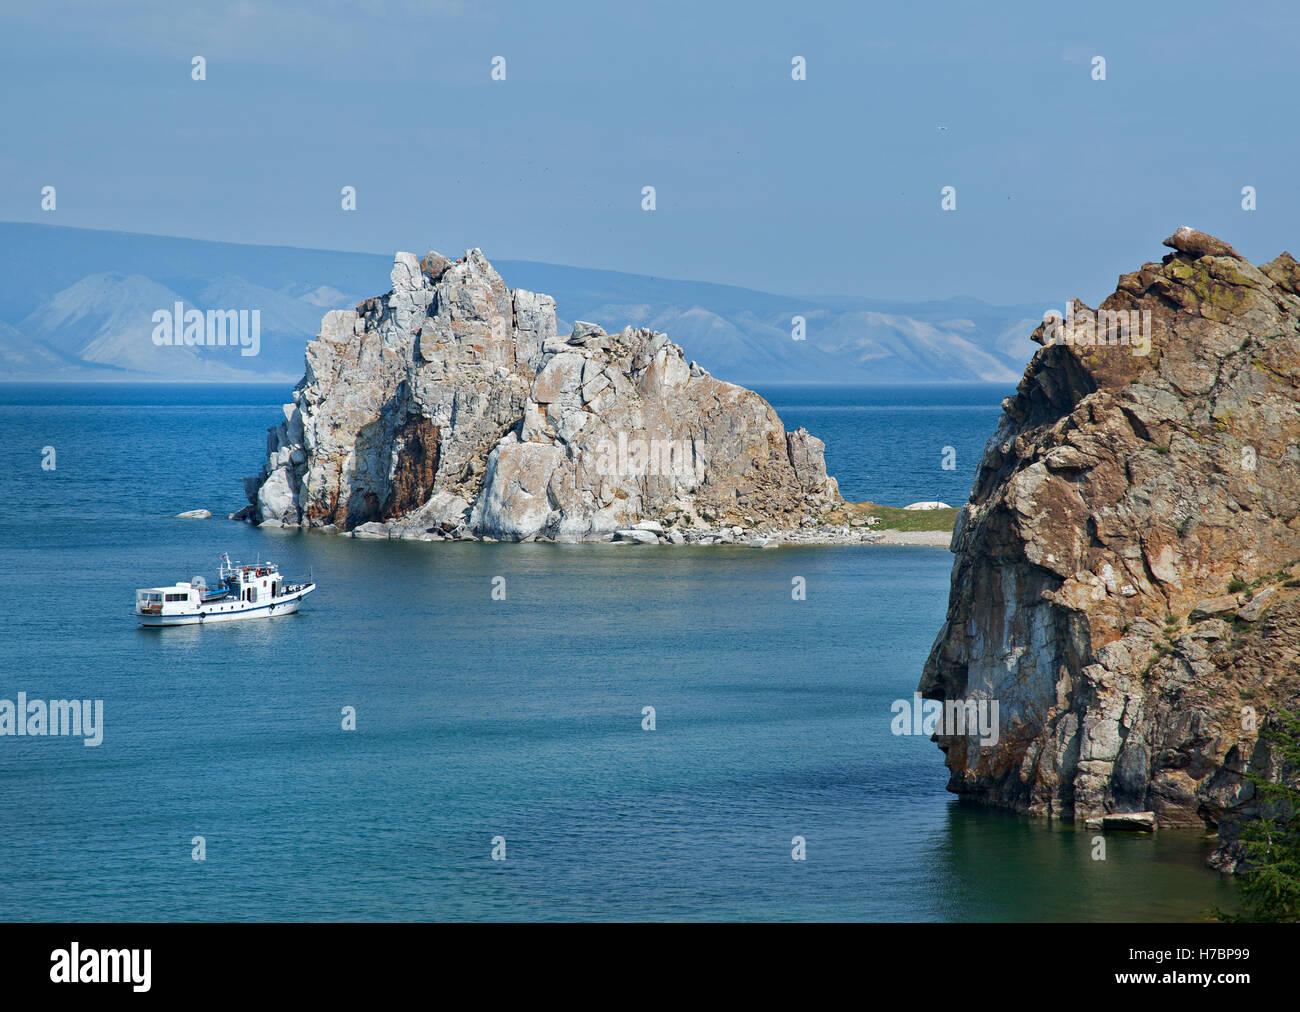 Rock Shamanka at headland Burhan  .Olkhon island, lake Baikal, Siberia, Russia - Stock Image